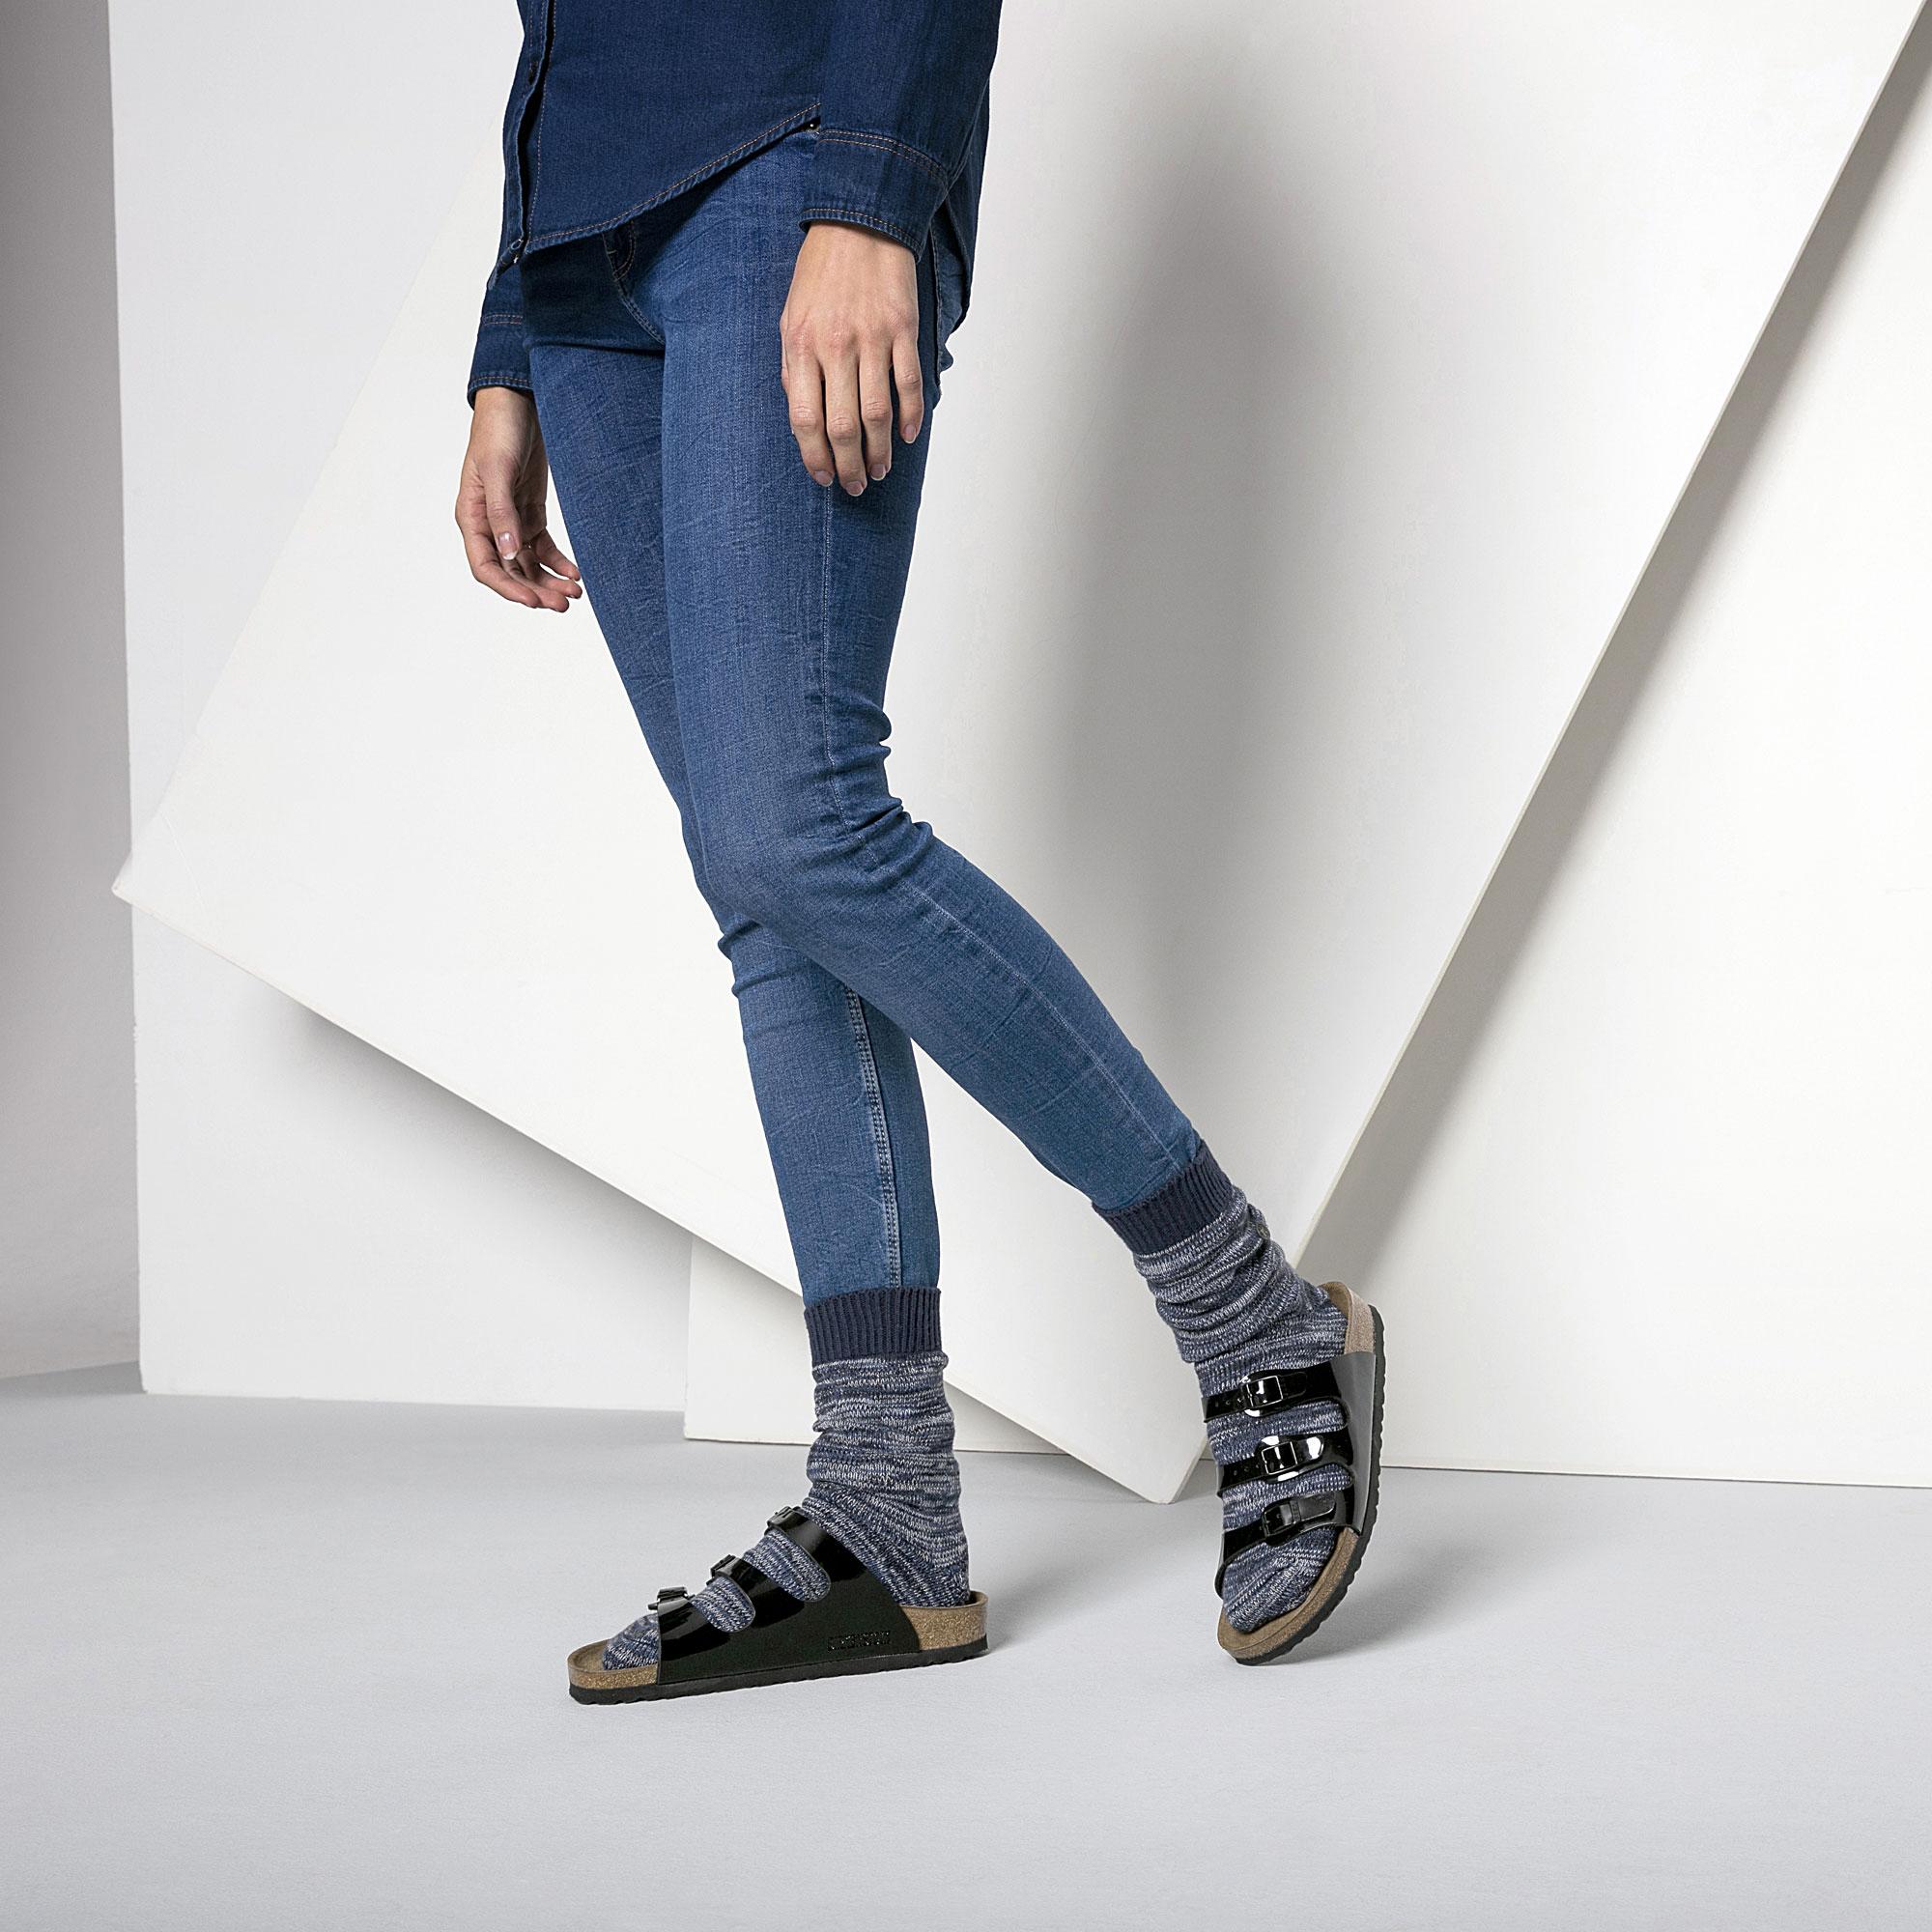 Birkenstock Florida Birko Flor, Men's Fashion, Footwear